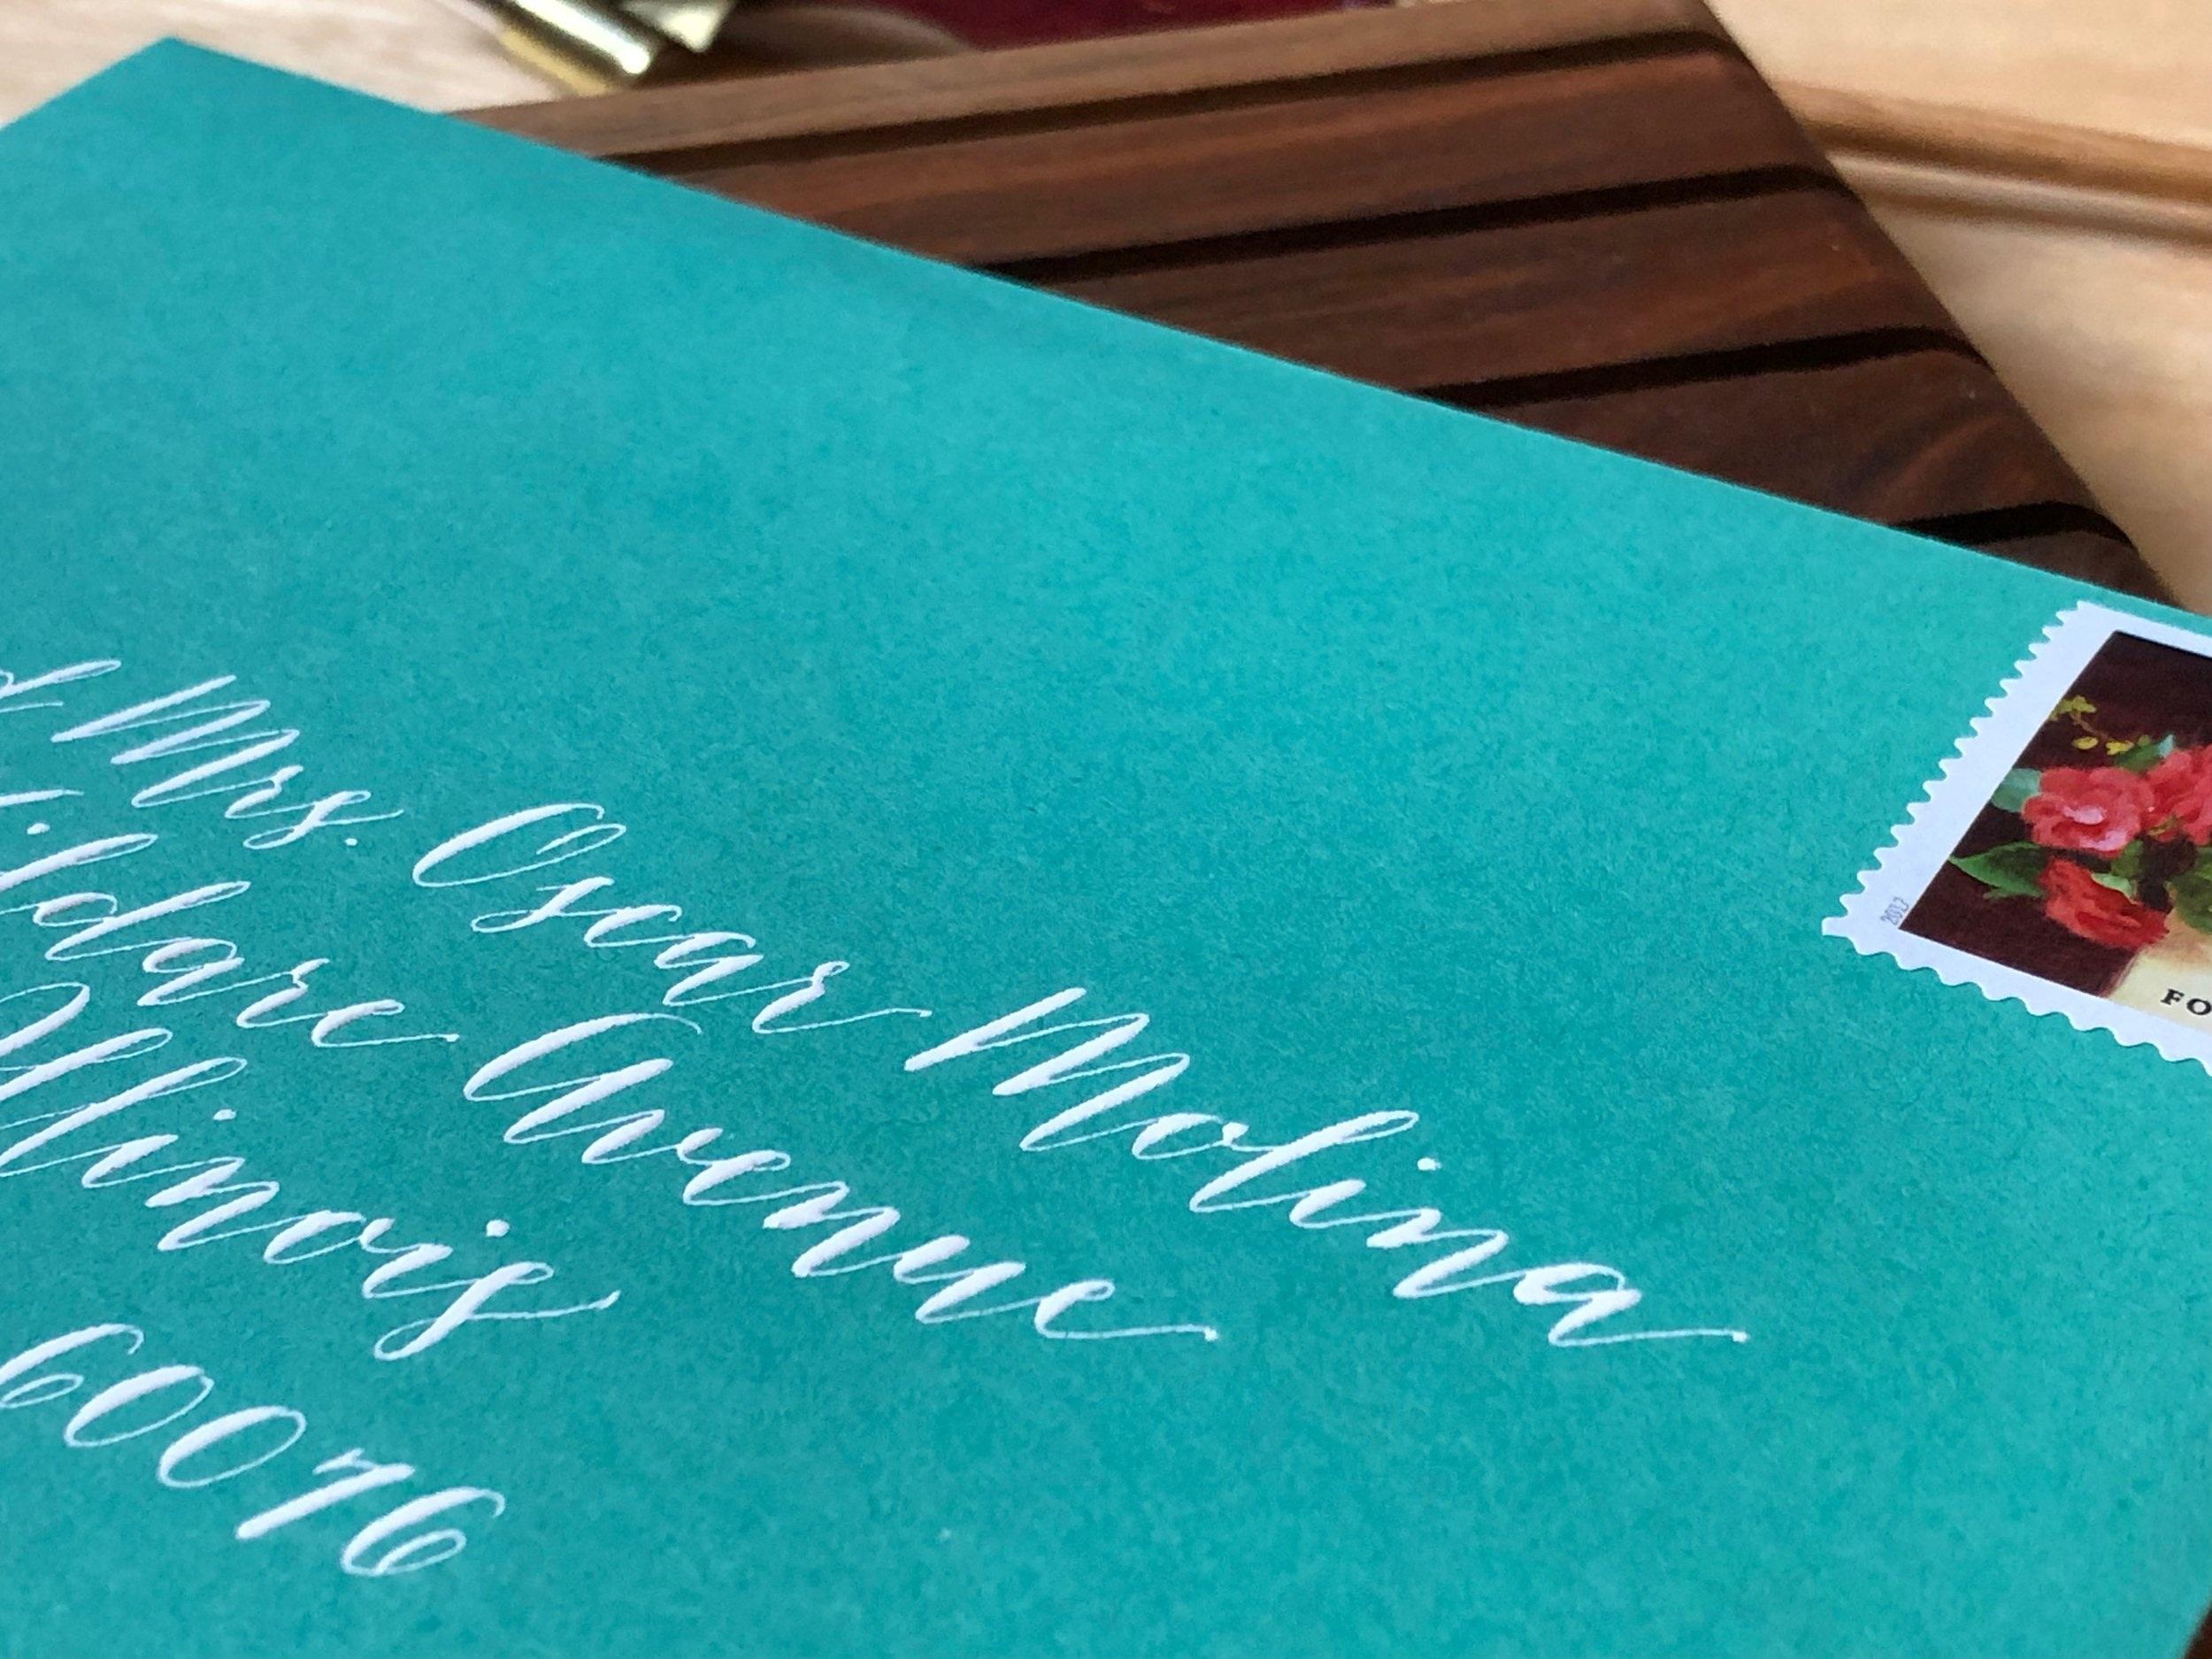 Jade+envelopes+%281%29.jpg